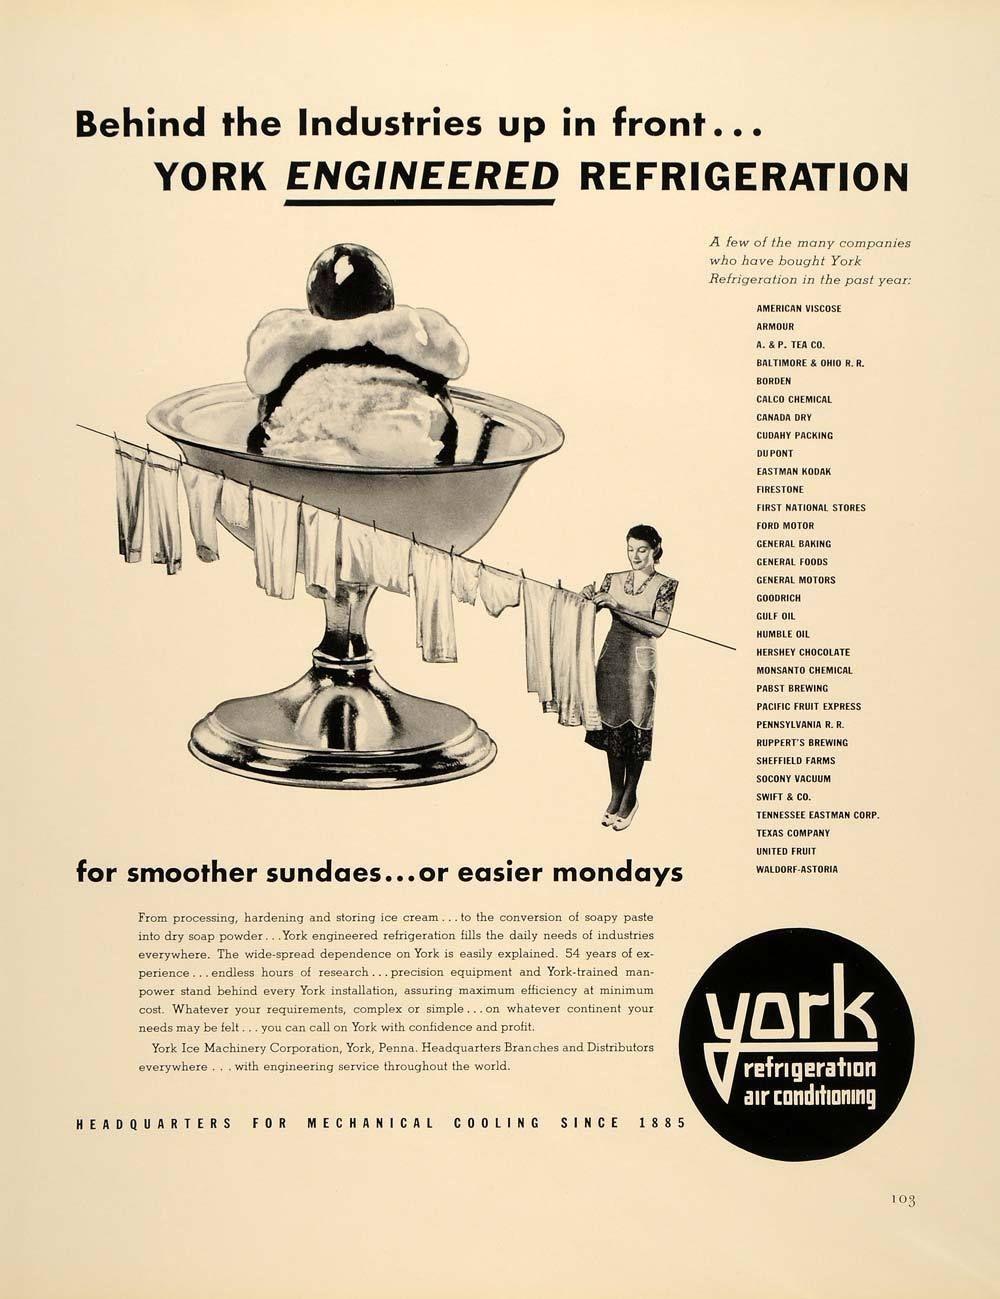 1939 Ad York Refrigeration Air Conditioning Ice Sundae